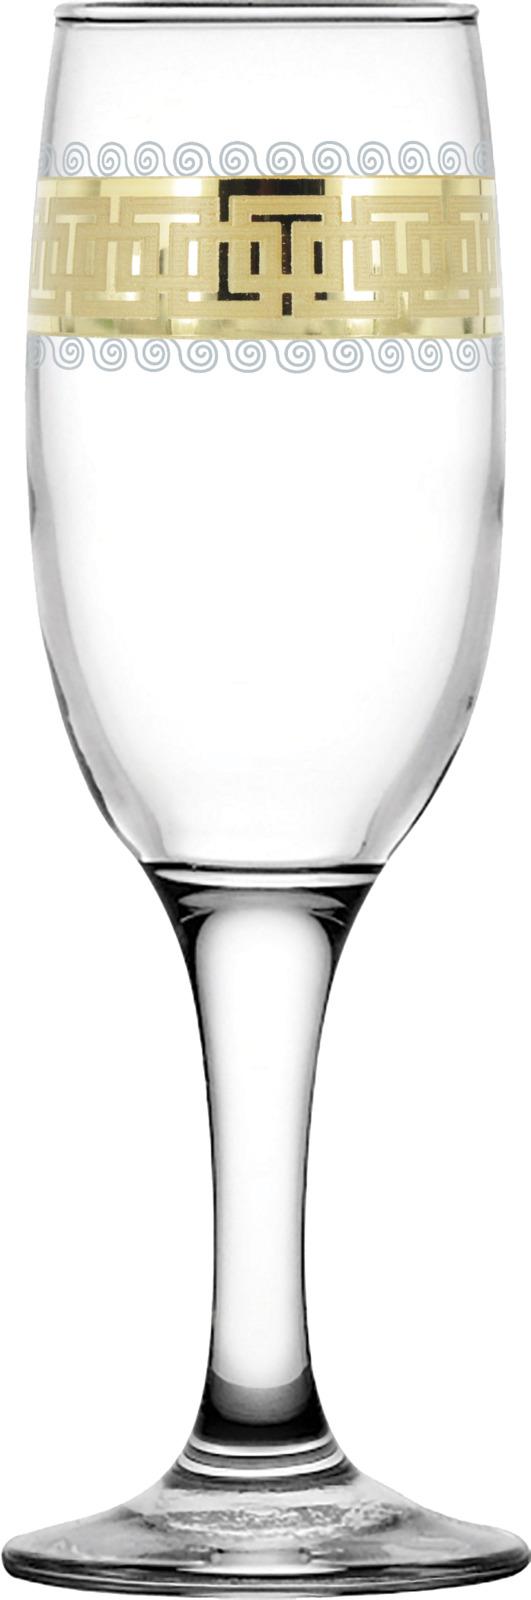 Набор бокалов Гусь-Хрустальный Меандр, EAV26-419, 190 мл, 6 шт набор бокалов гусь хрустальный золотой карат